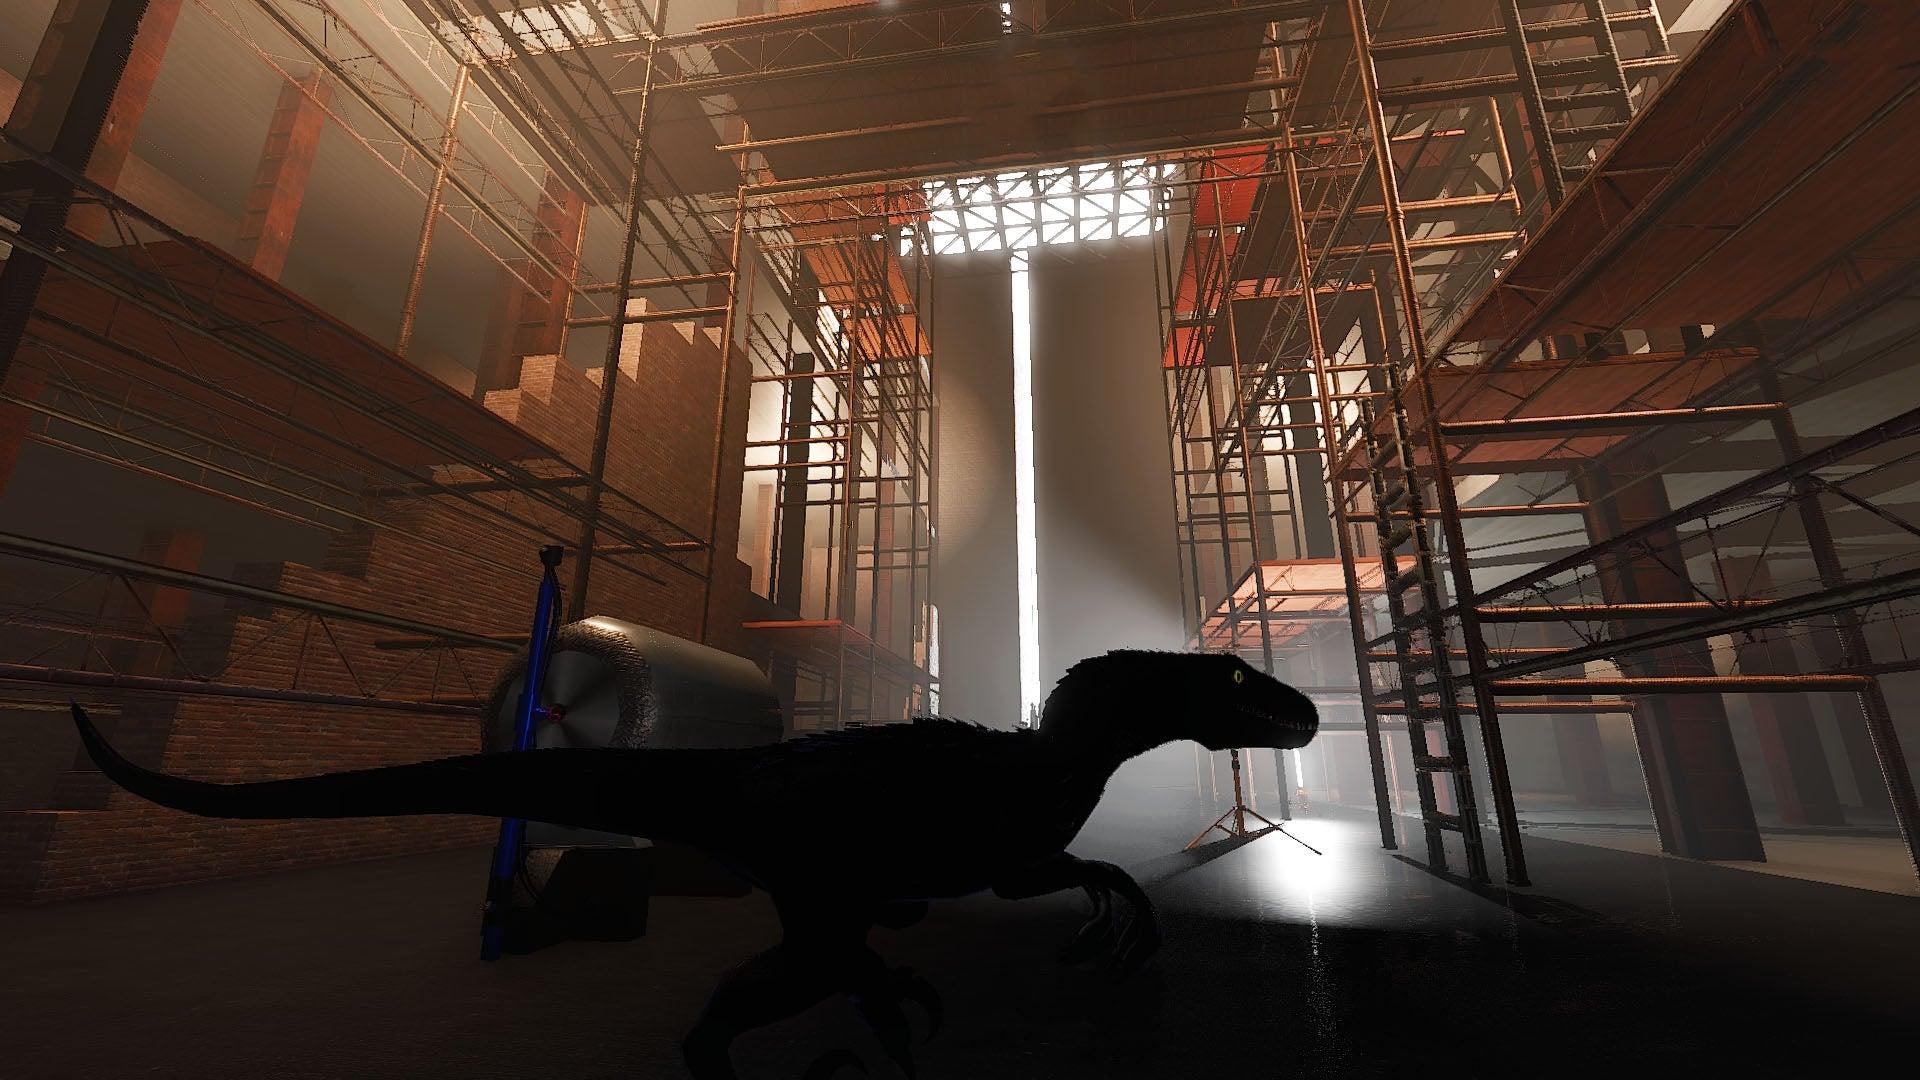 arcen-games in-case-of-emergency-release-raptor steam steamed